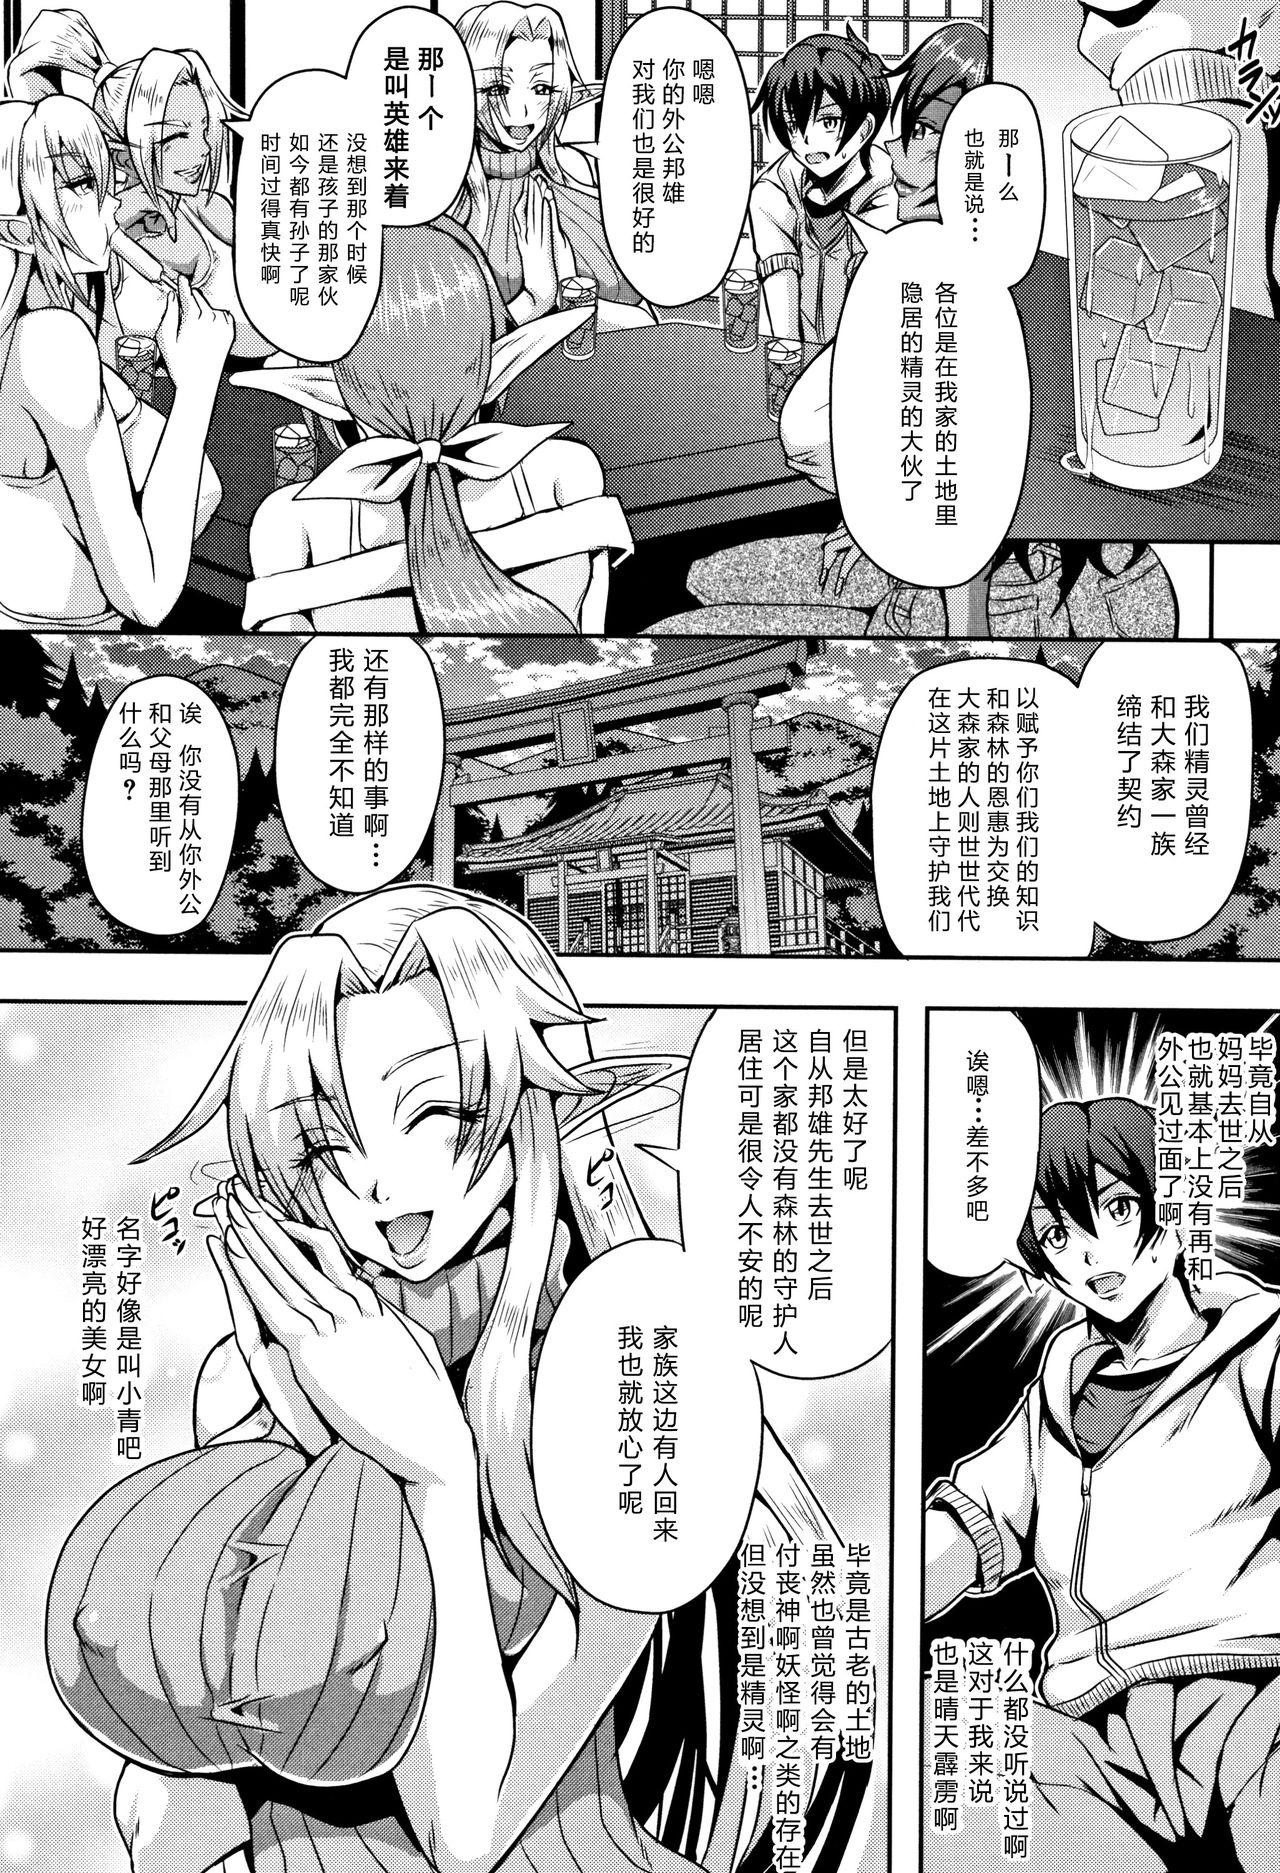 Elf Harem no Mori to Kozukuri Keiyaku | 妖精后宮生子契約 7